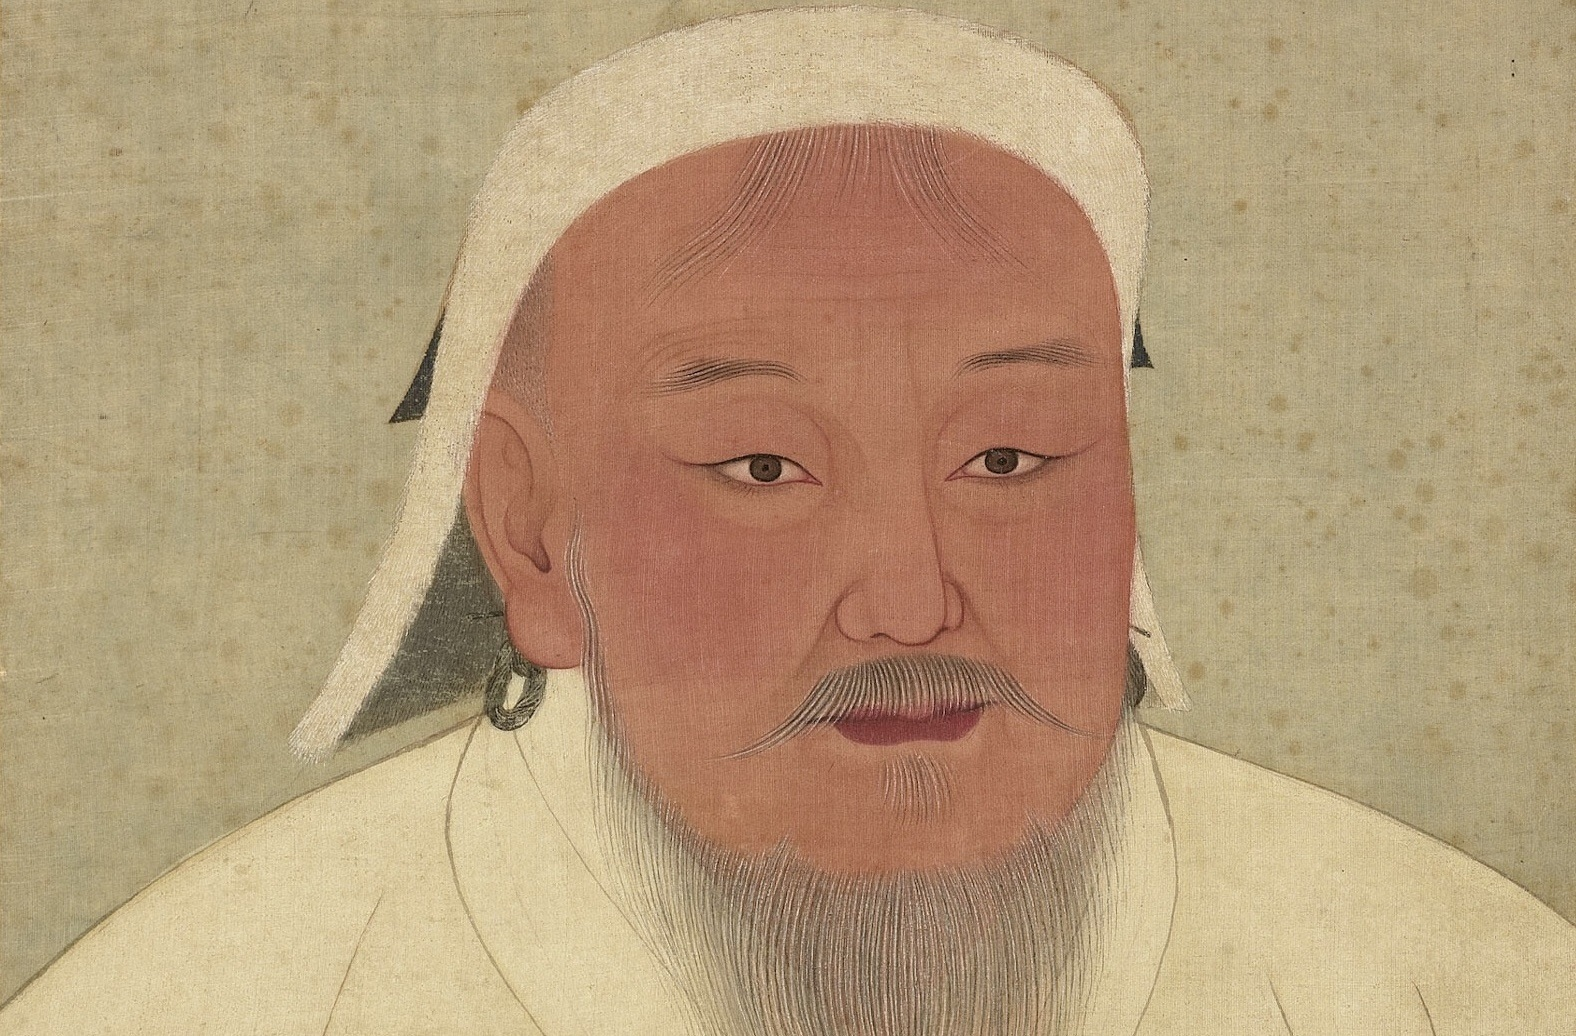 Moğol İmparatoru Cengiz Han'ın sıkı sıkıya bağlı olduğu 15 yasa